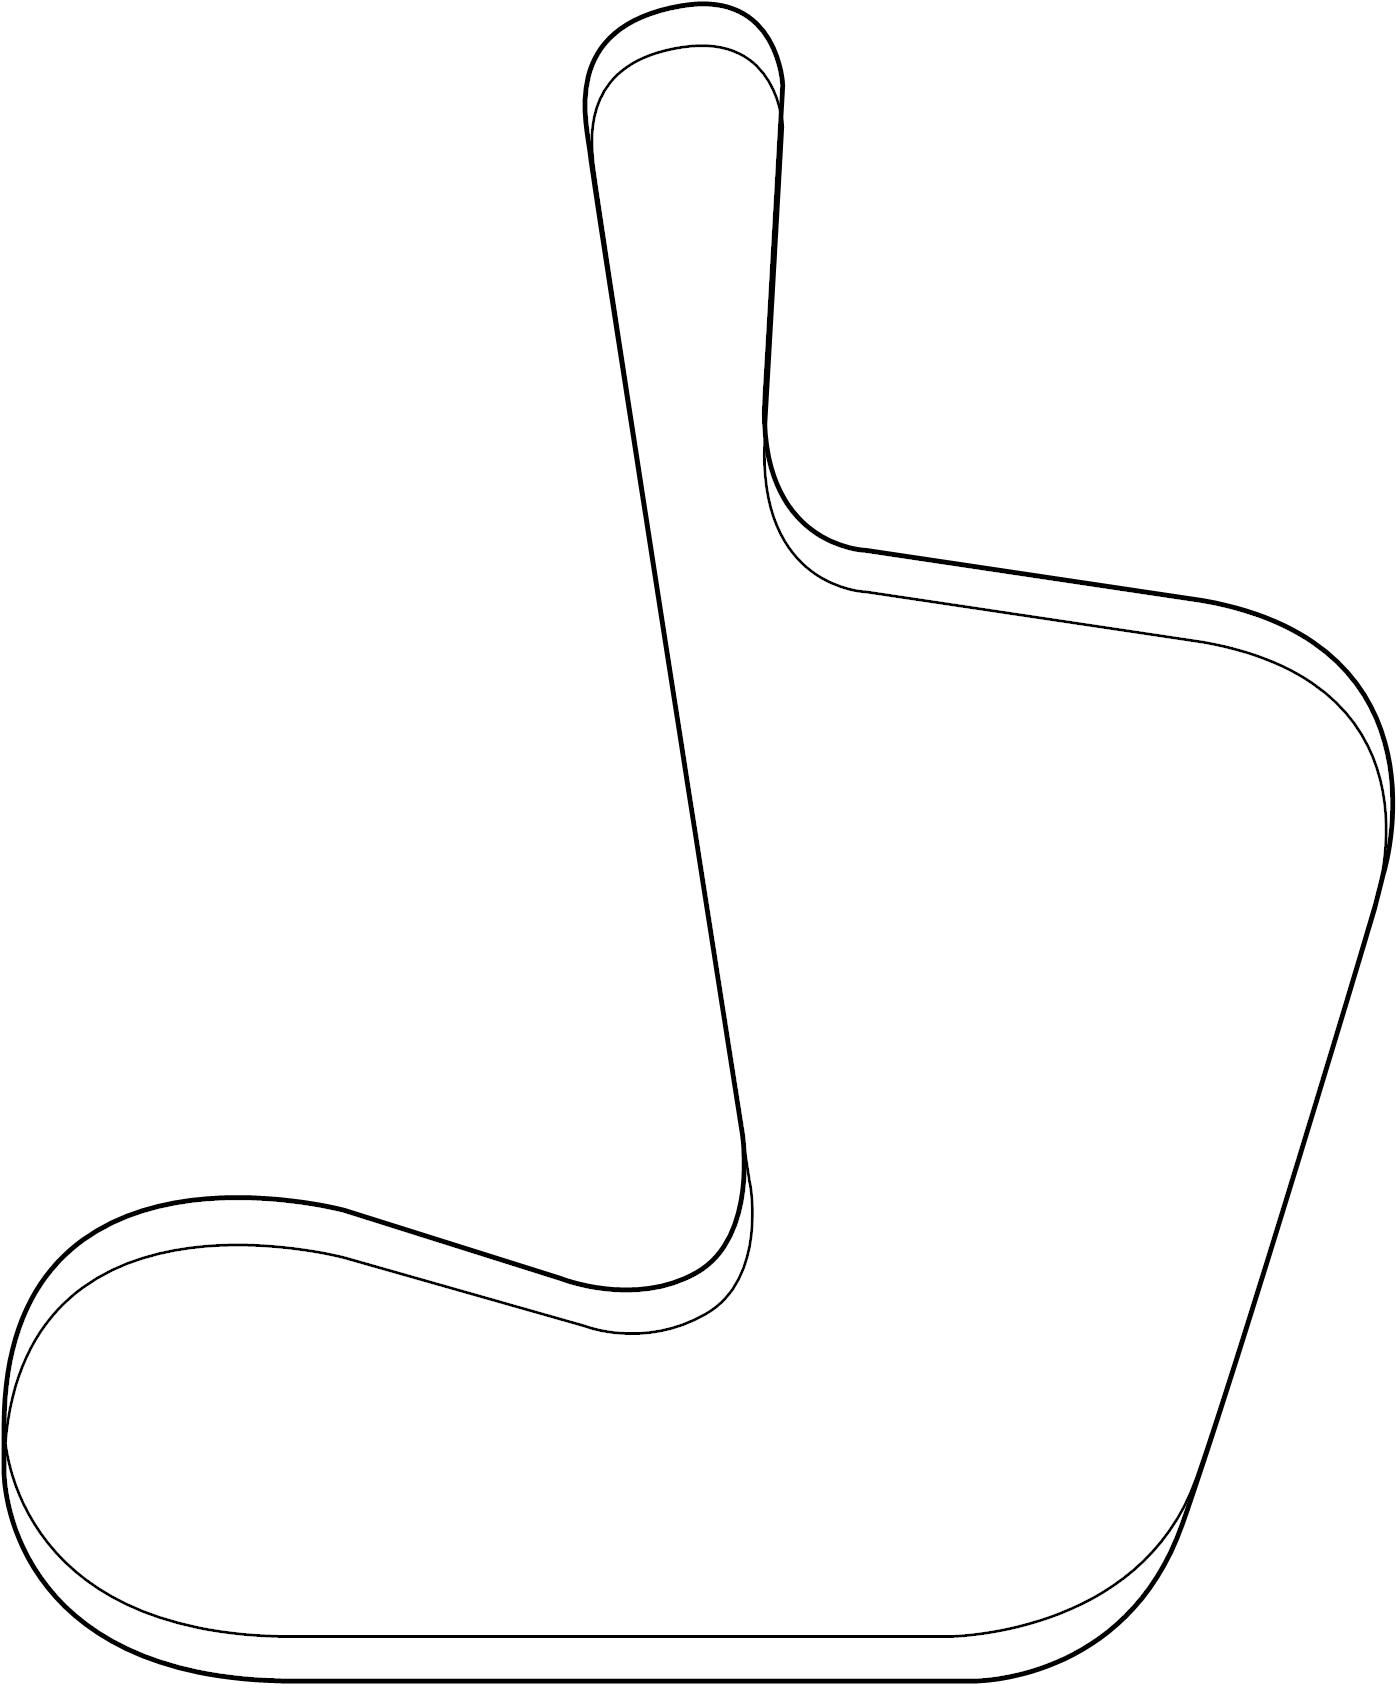 Volkswagen Routan Ribbedbelt Serpentine Belt 4 0 Liter Routan 4 0l